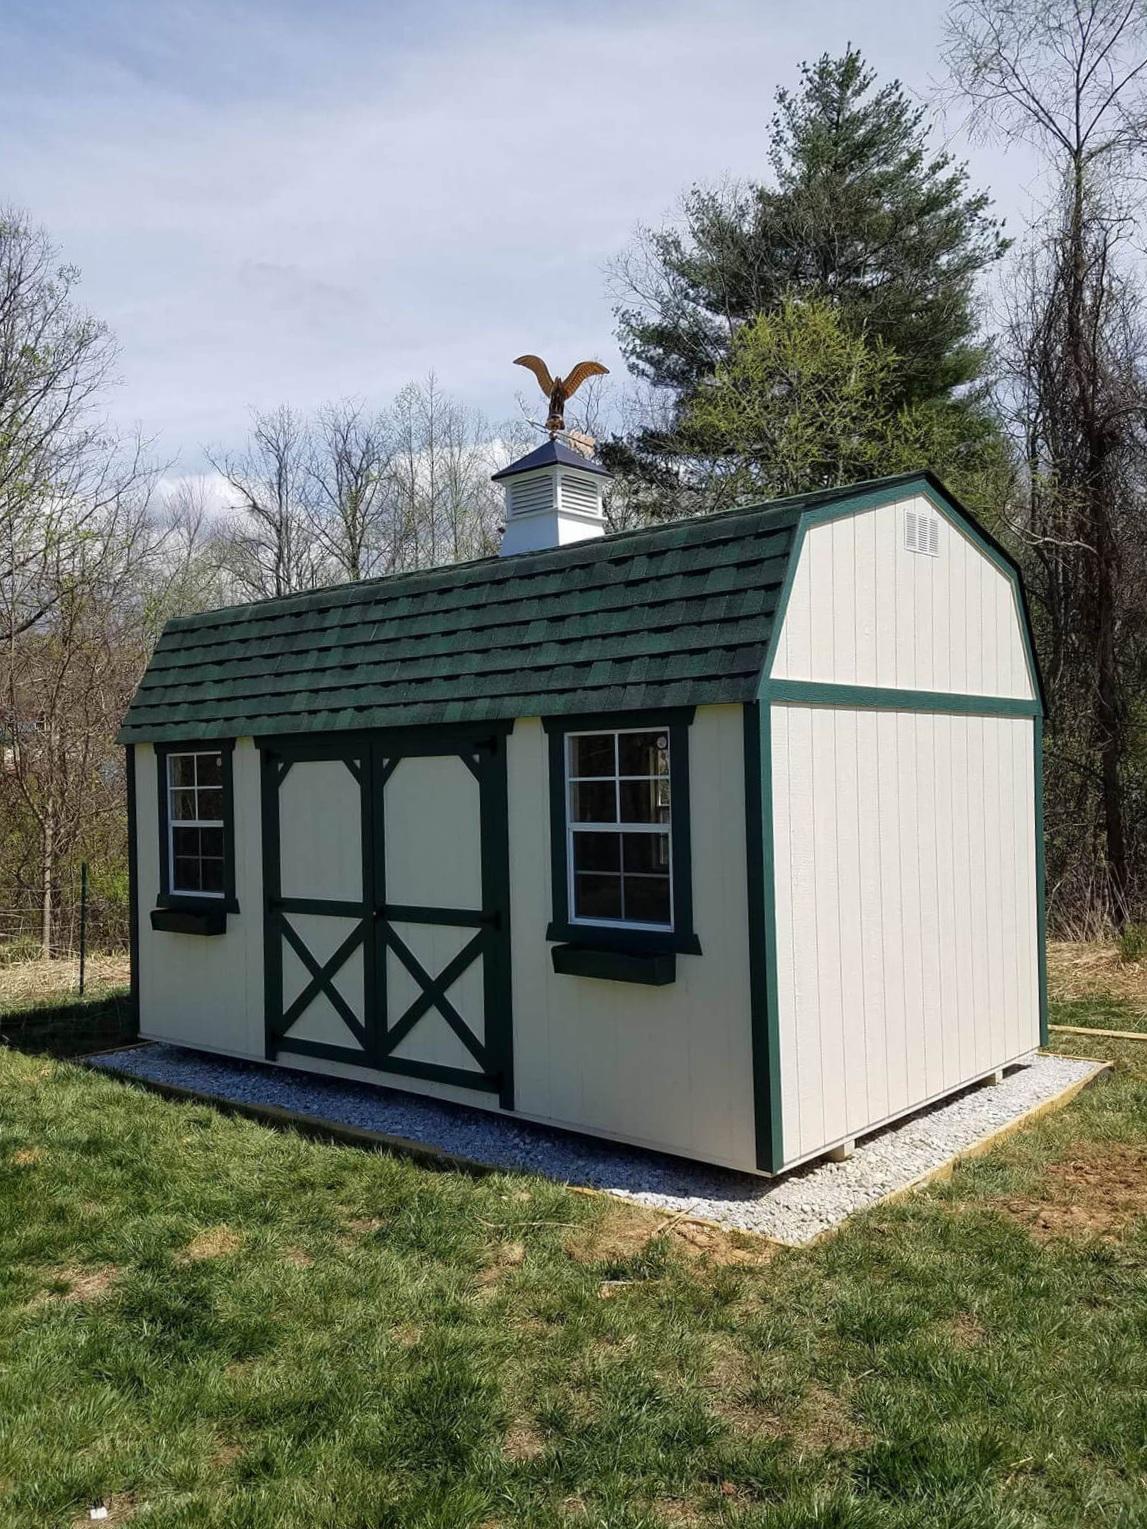 painted-shed-on-prepared-pad.jpg